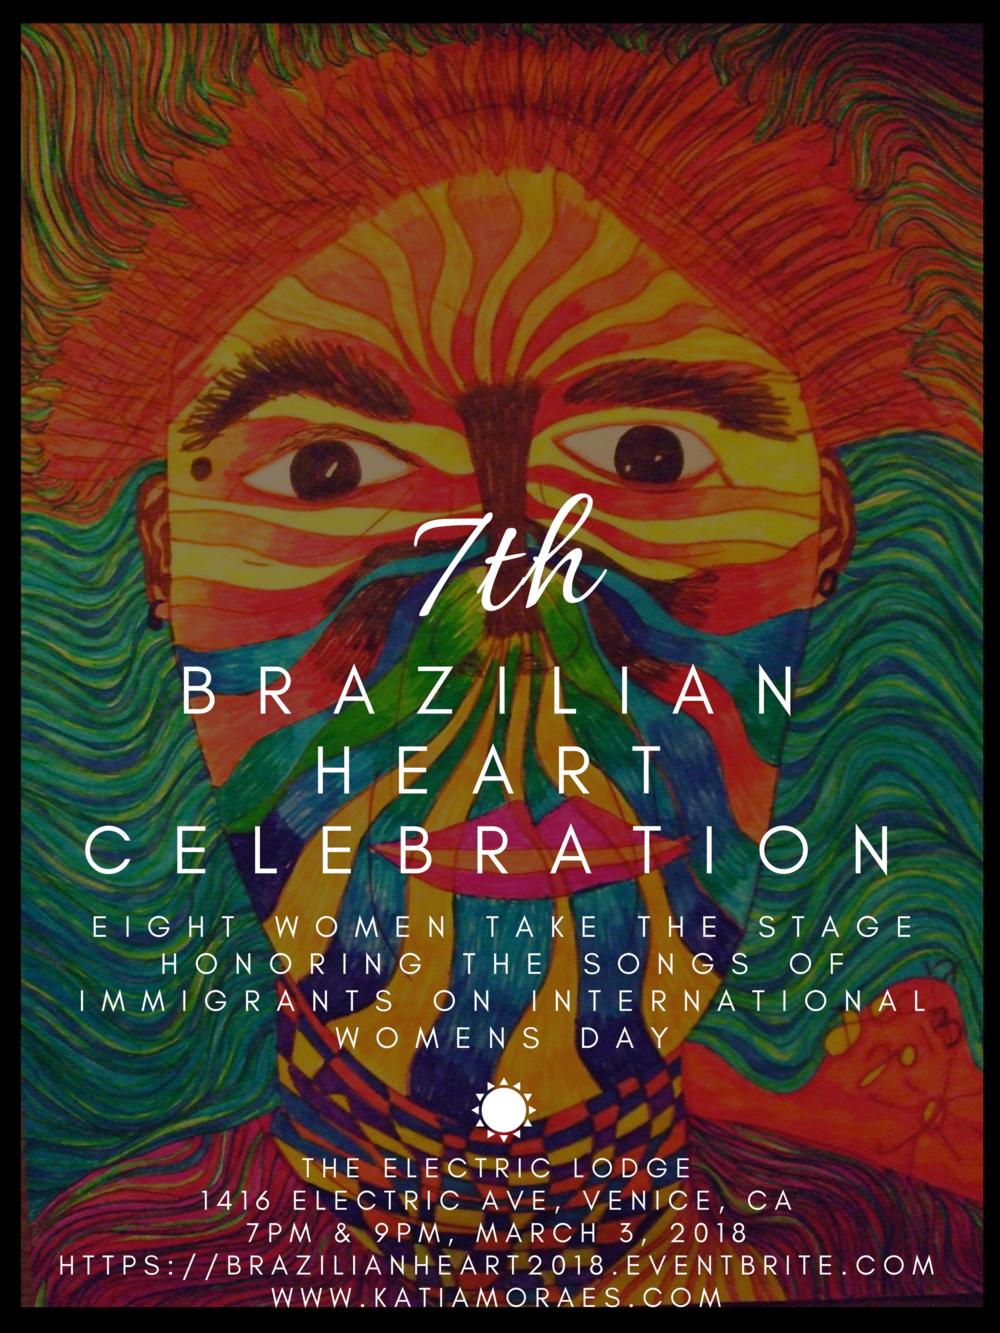 The 7th Brazilian Heart Celebration